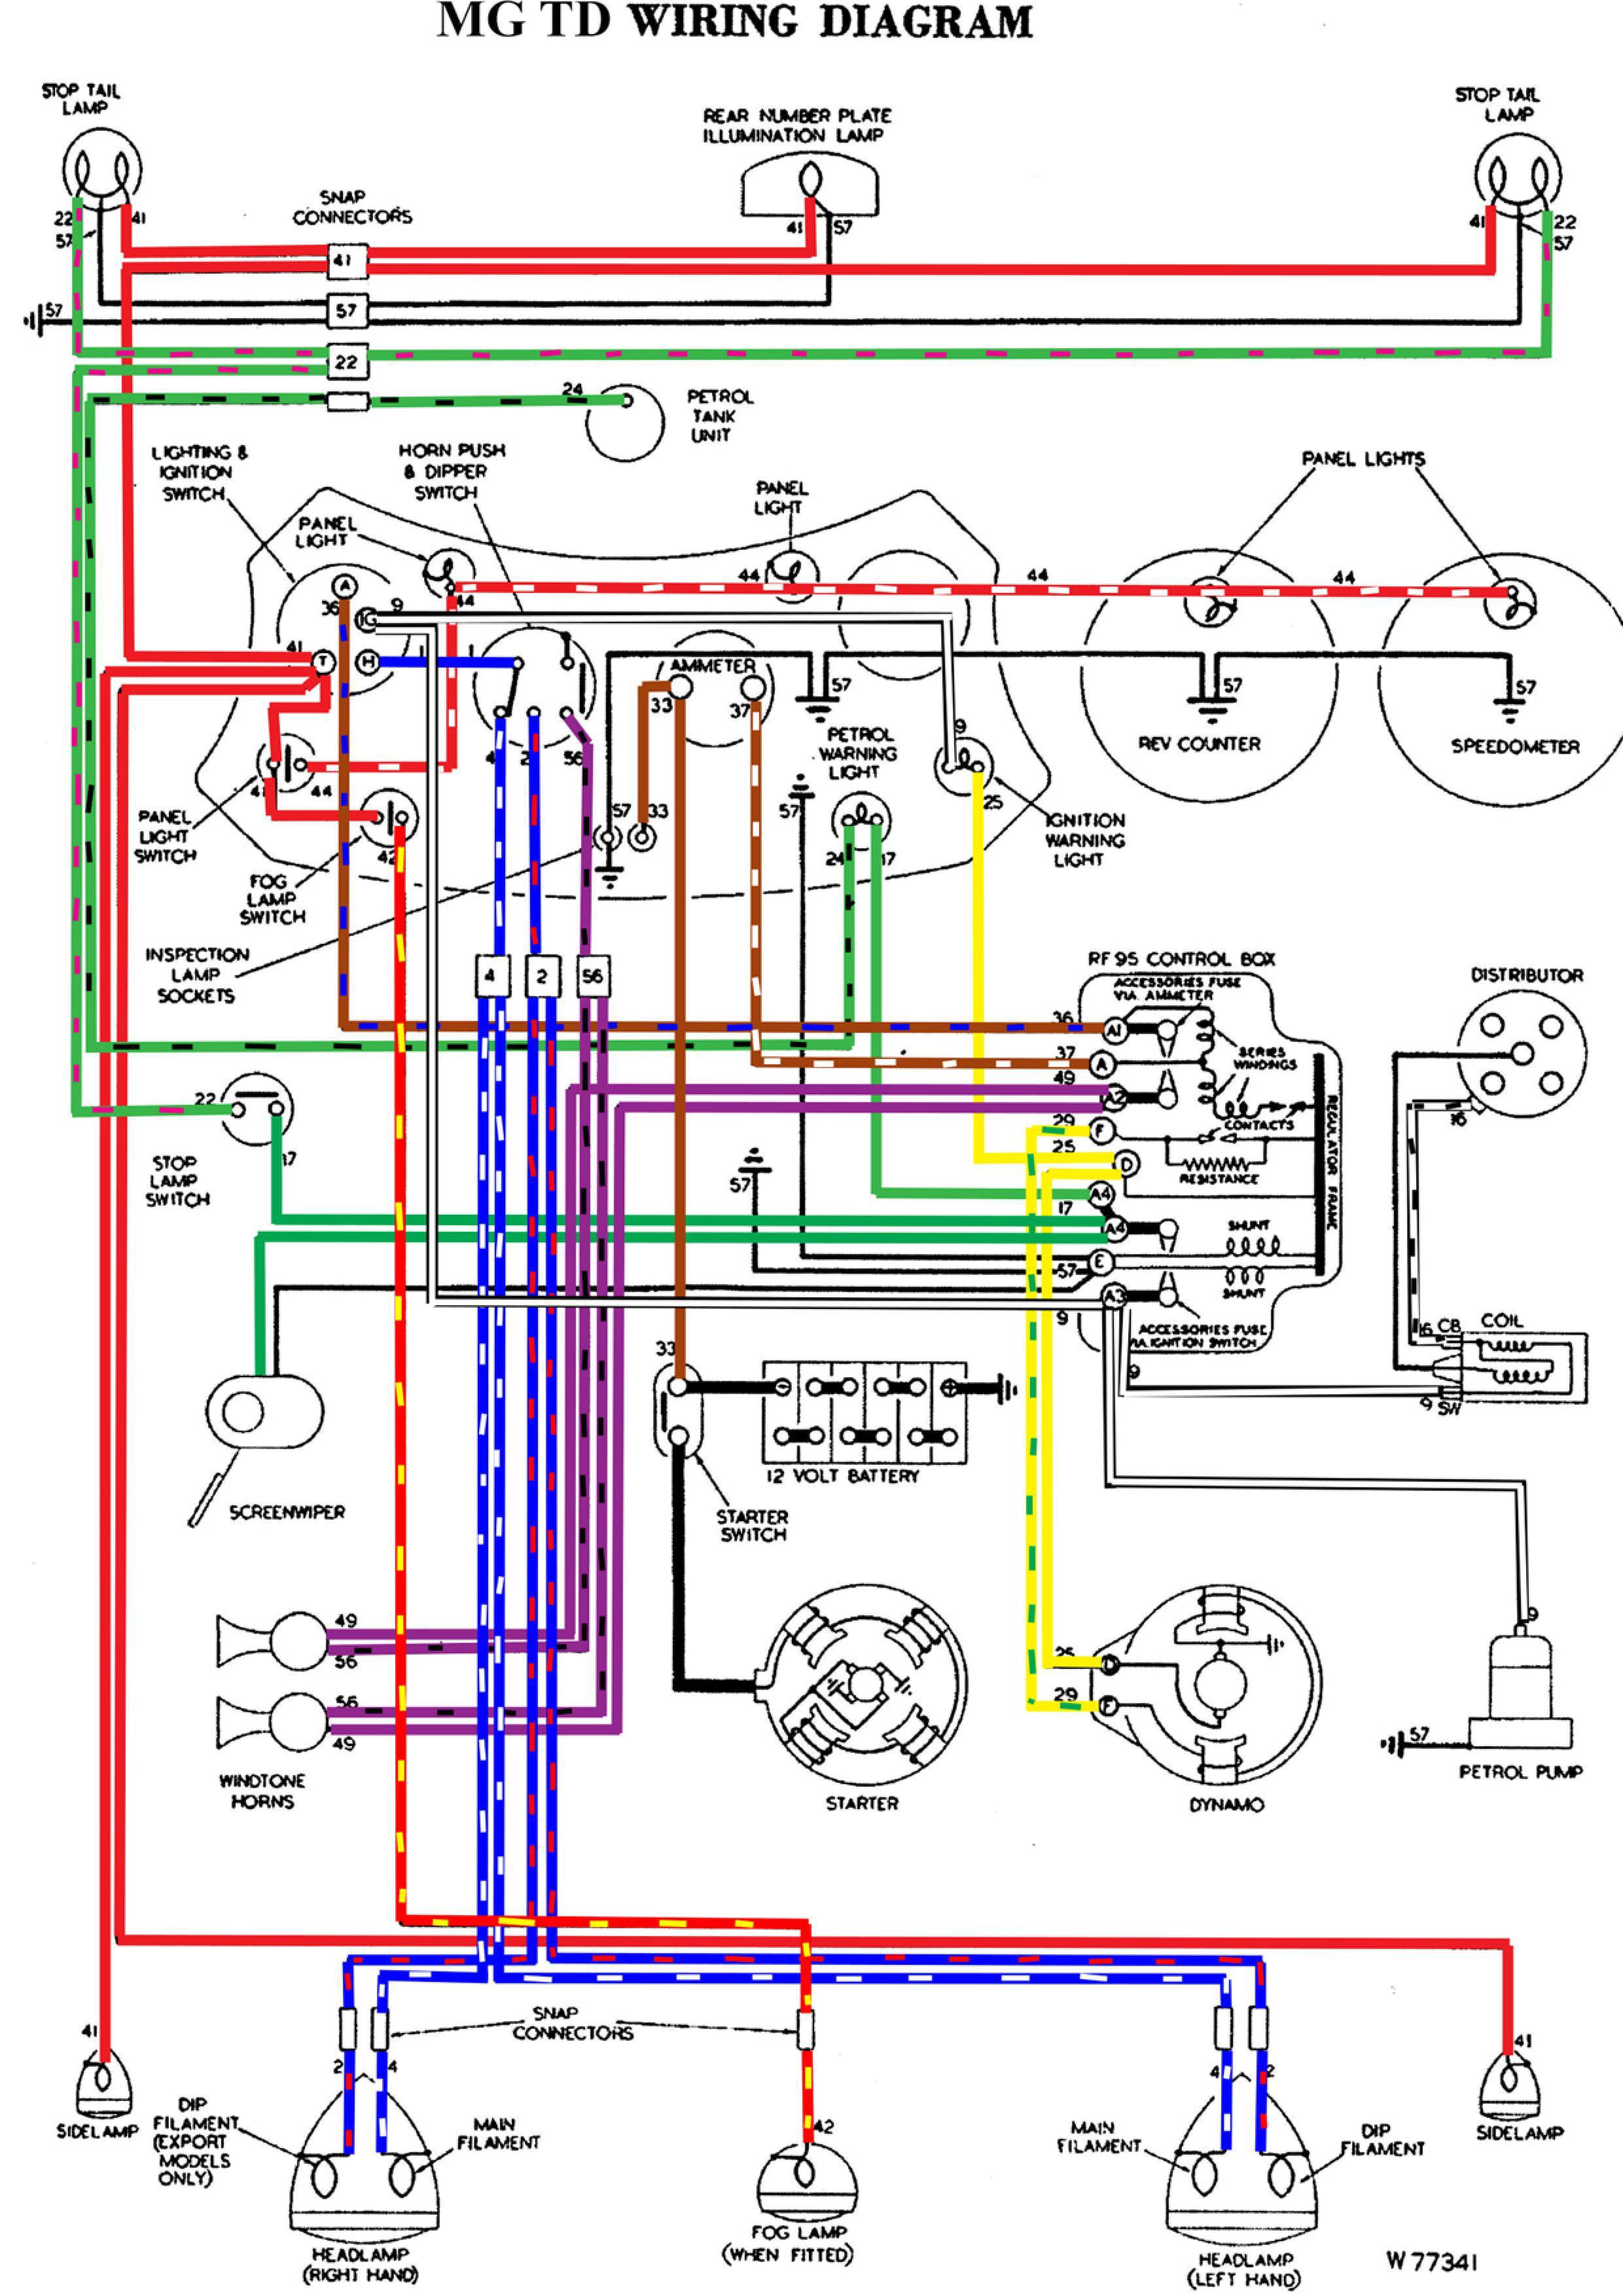 austin healey sprite wiring diagram 25f5f mg tc wiring diagram wiring resources  25f5f mg tc wiring diagram wiring